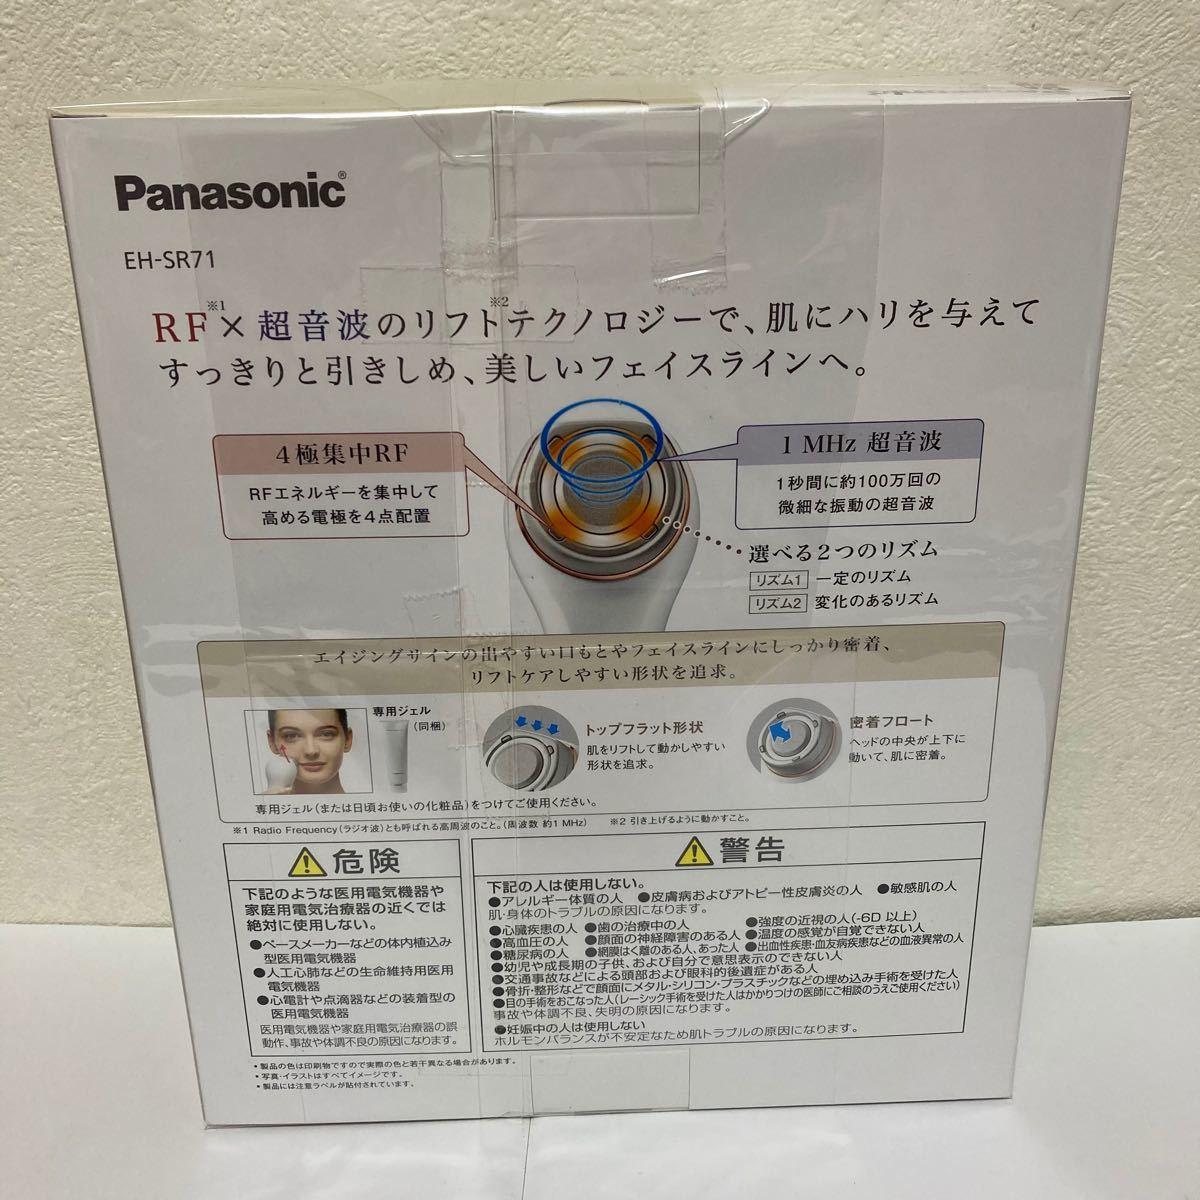 Panasonic EH-SR71-P 新品未開封 RF美容器 ピンク パナソニック 美顔器